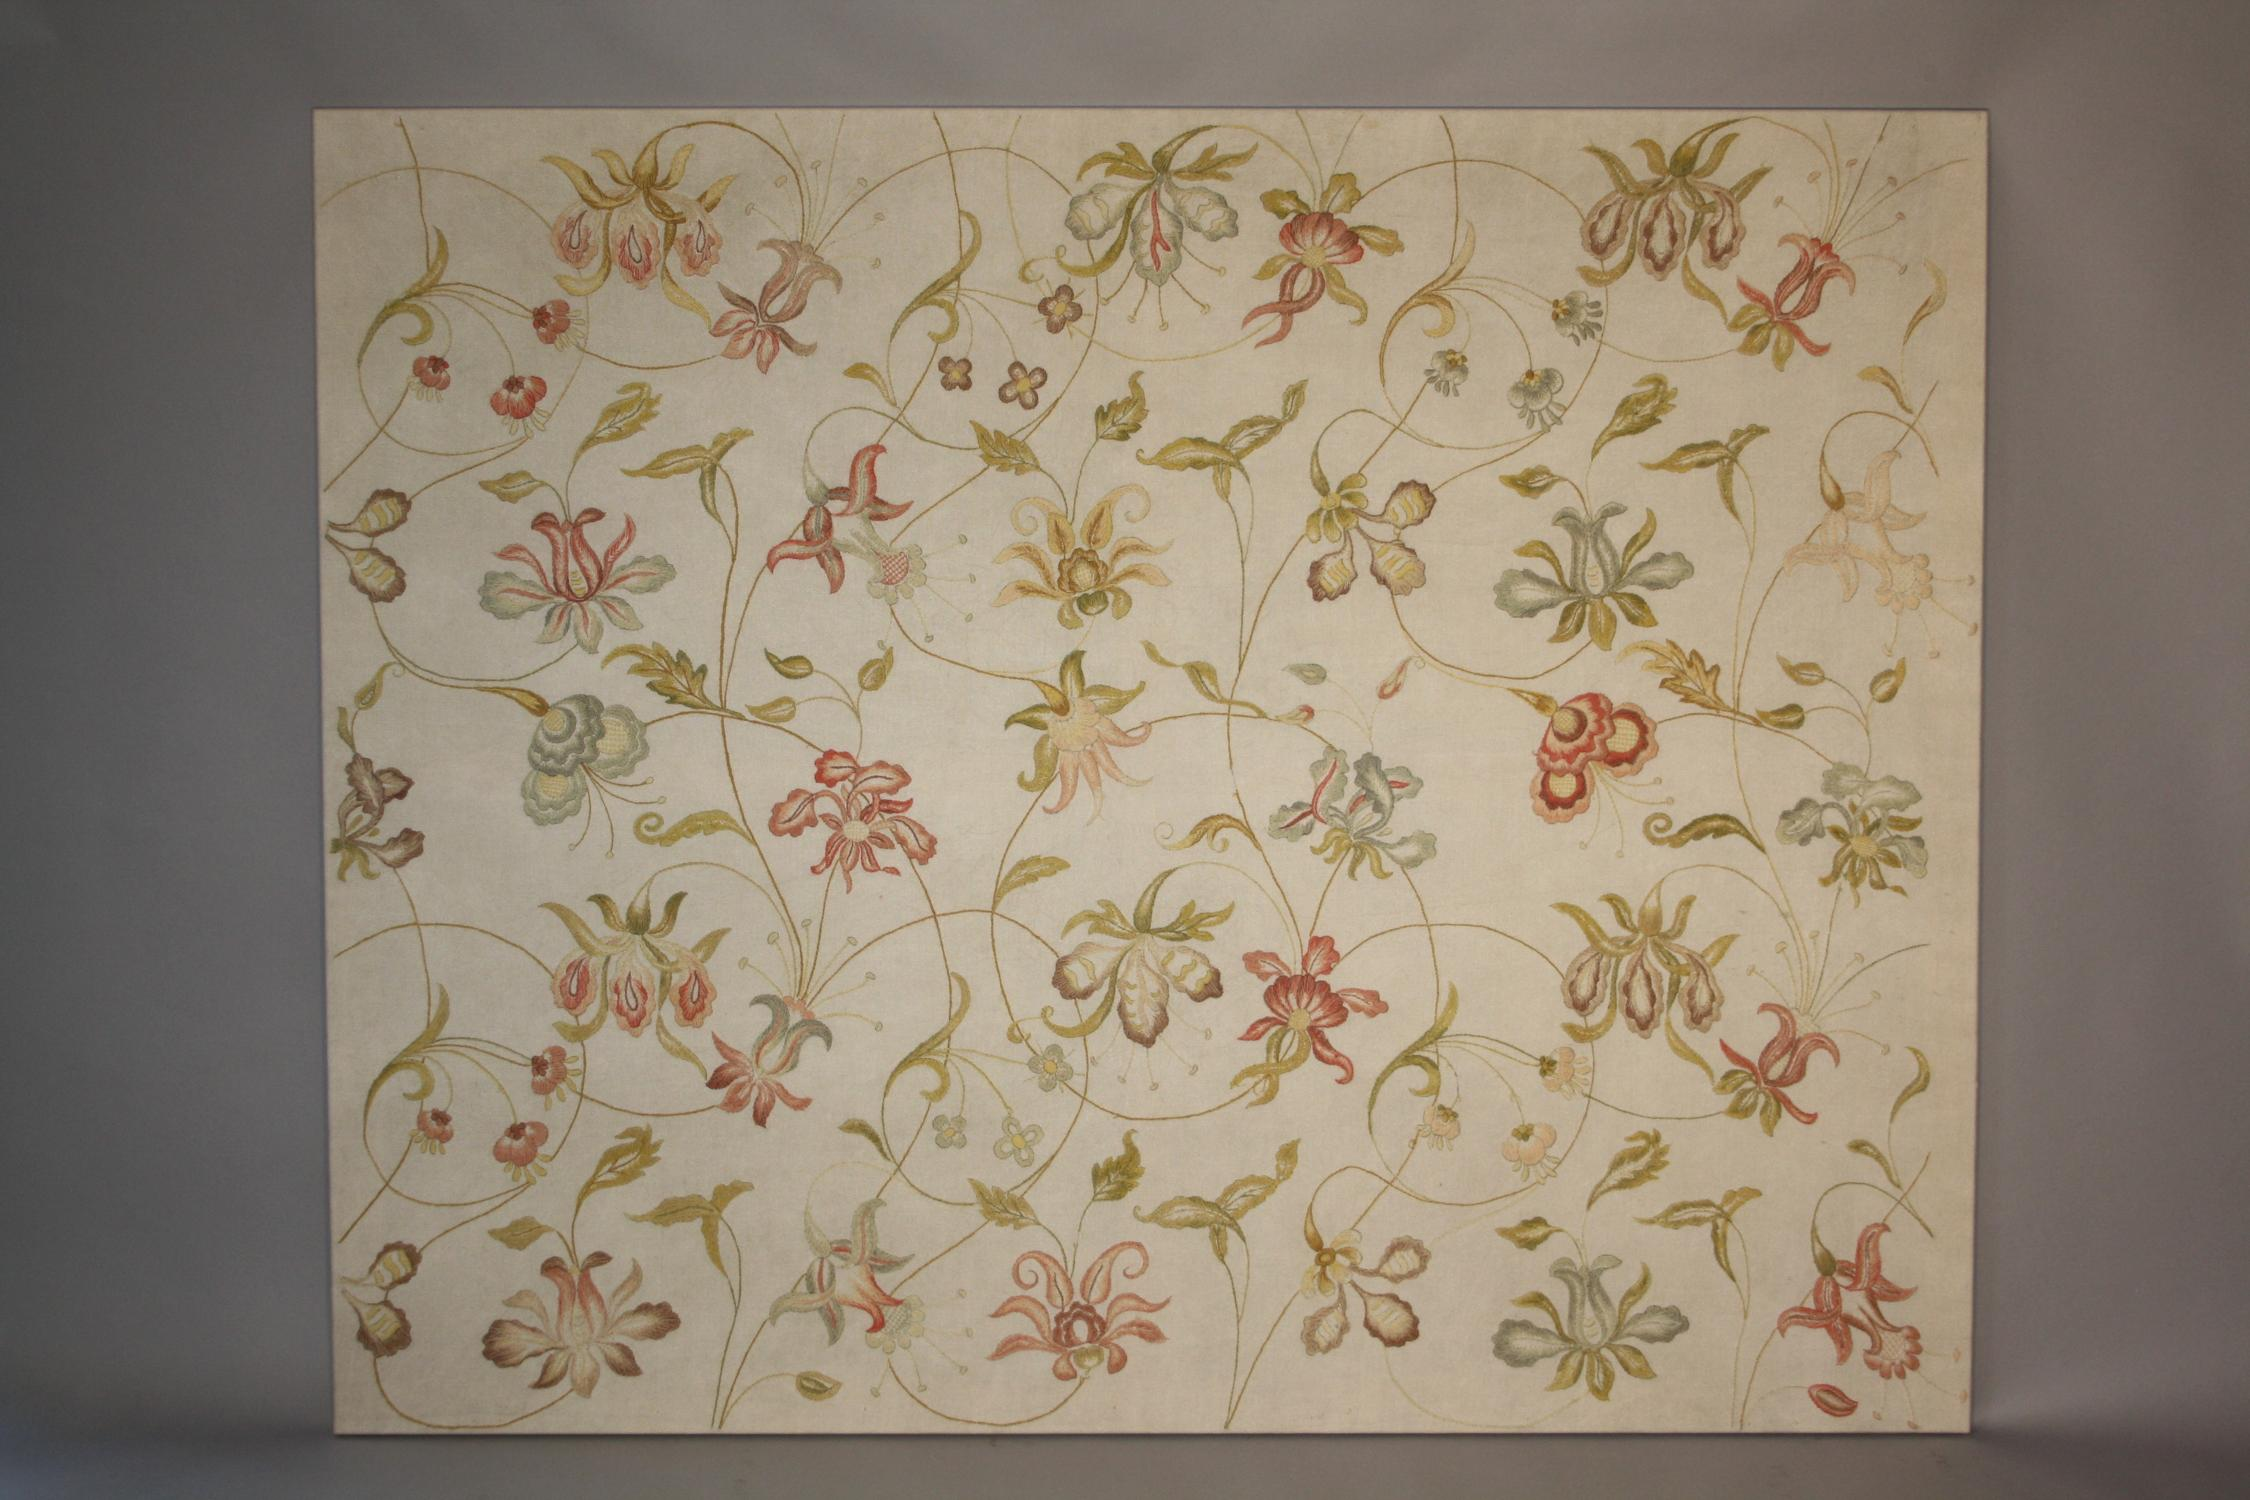 Crewel work textile